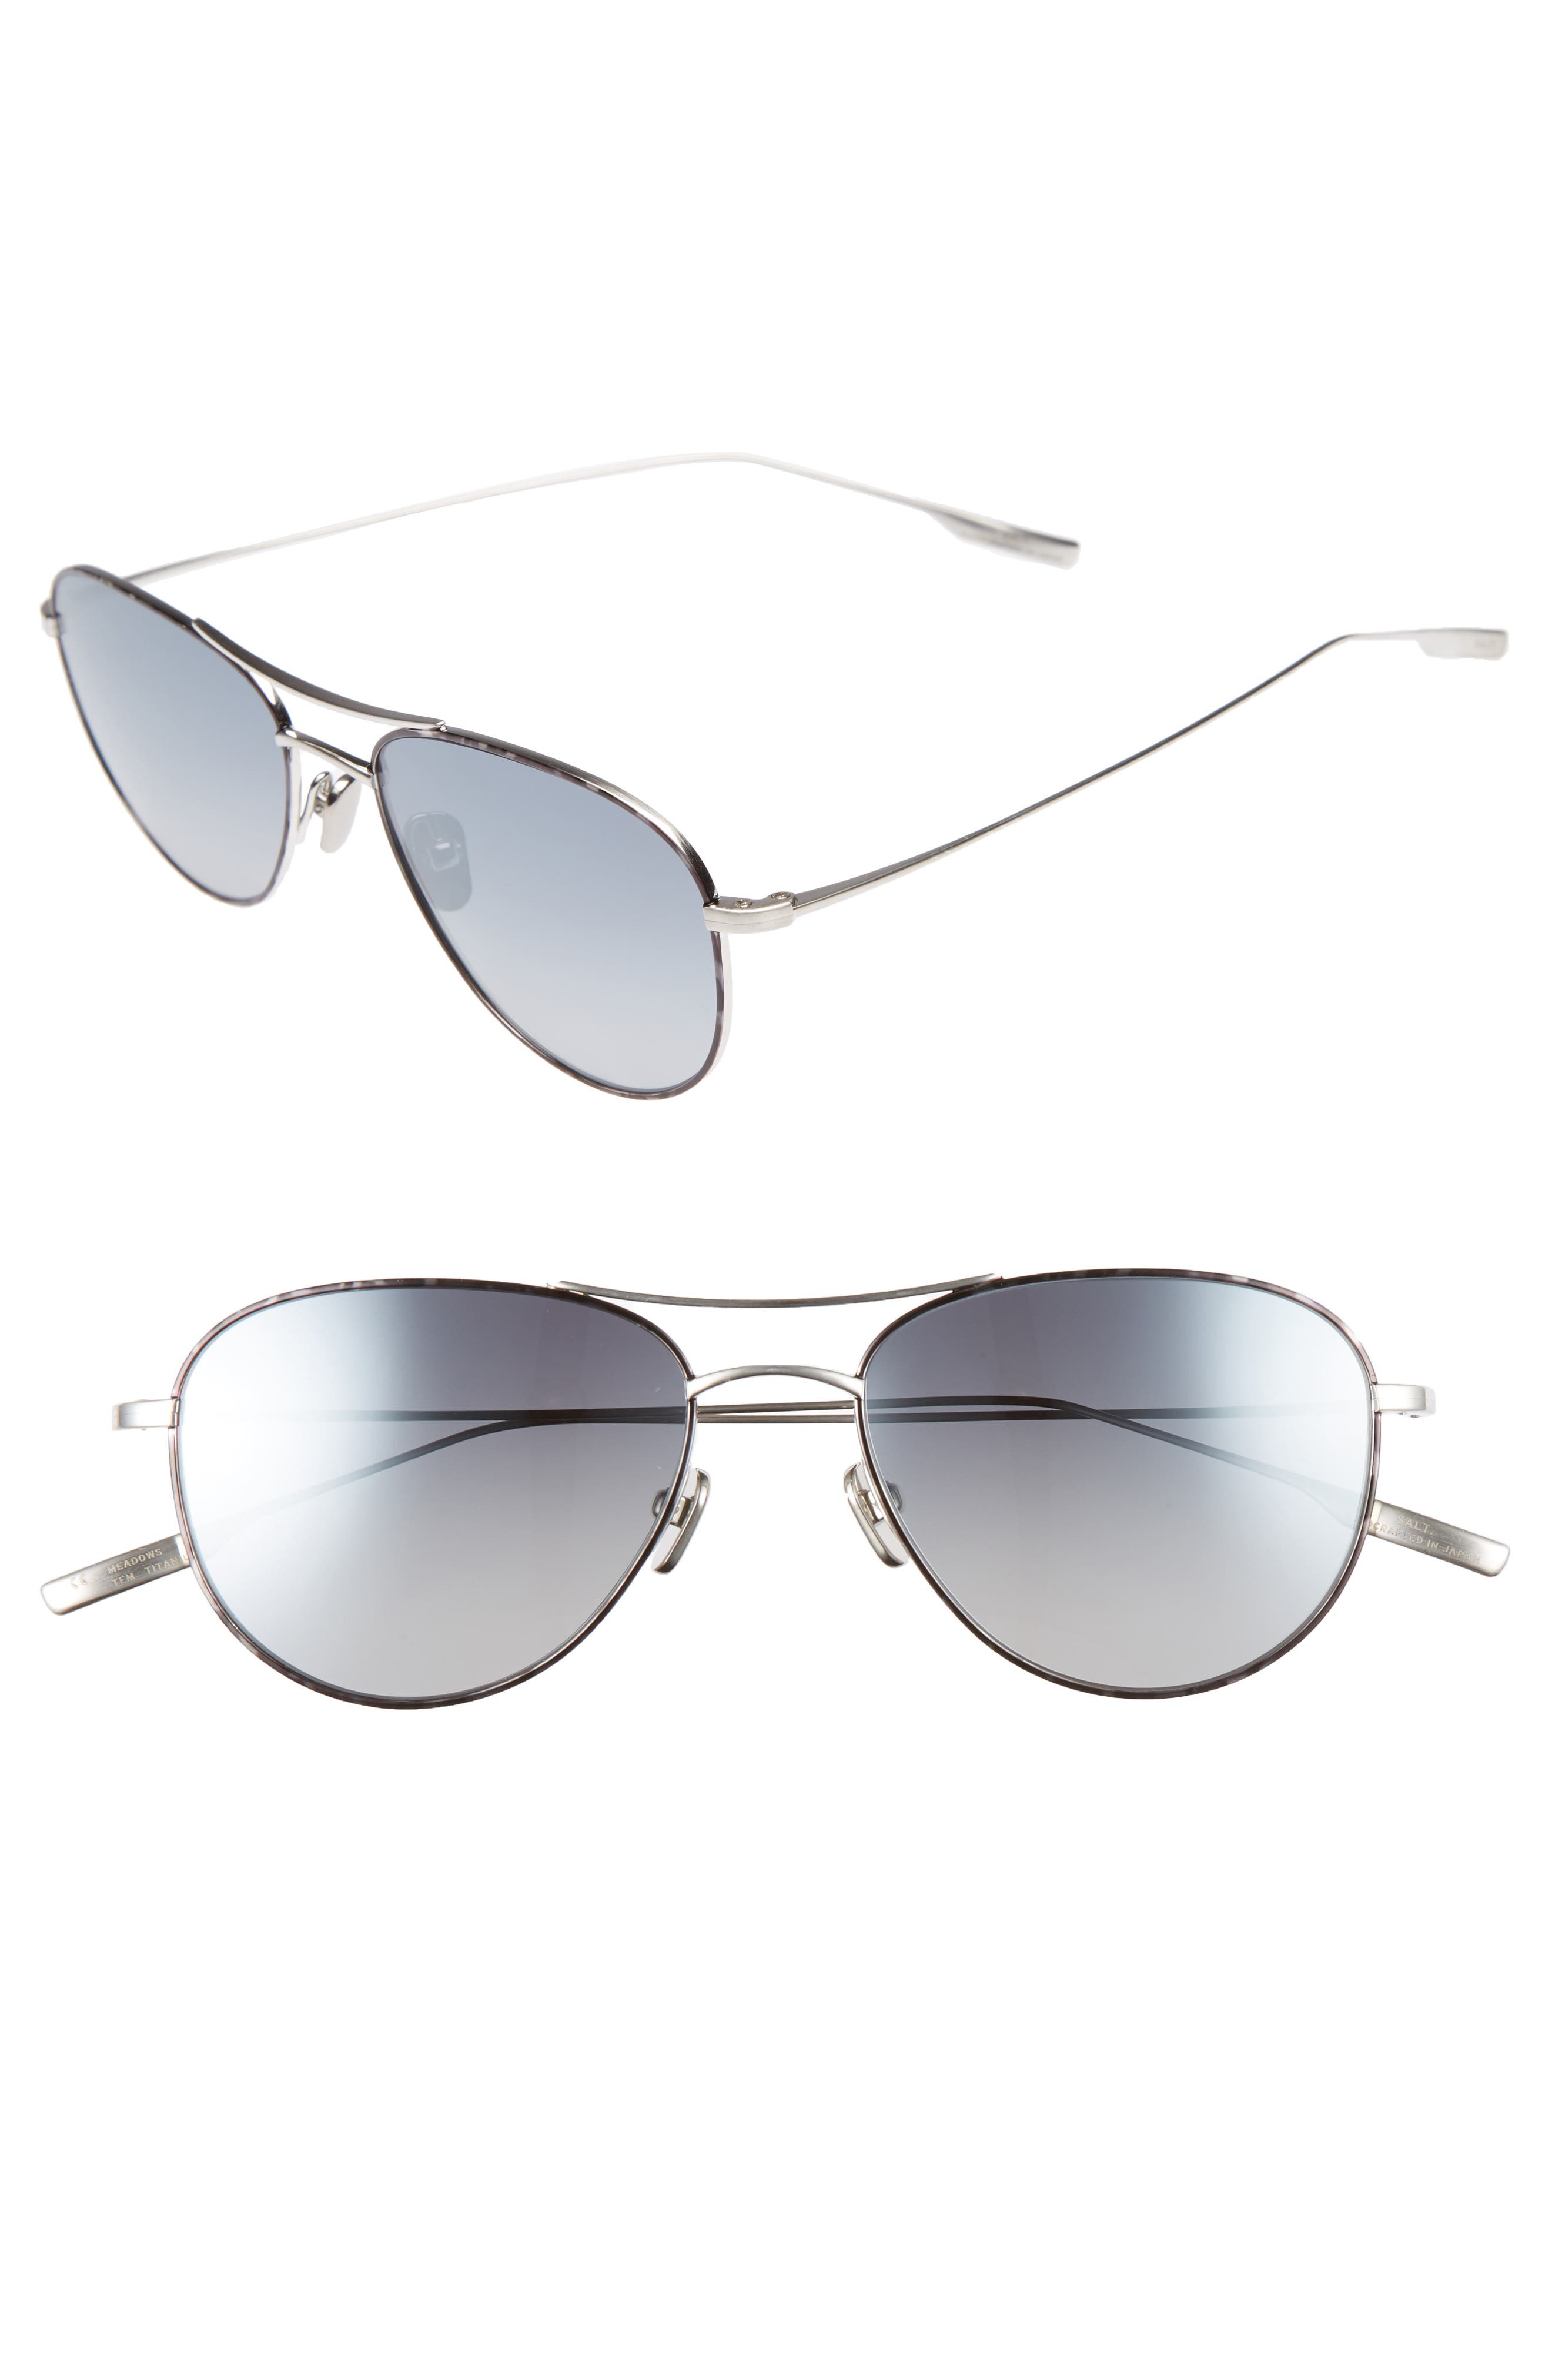 Main Image - SALT 'Meadows' 54mm Polarized Aviator Sunglasses